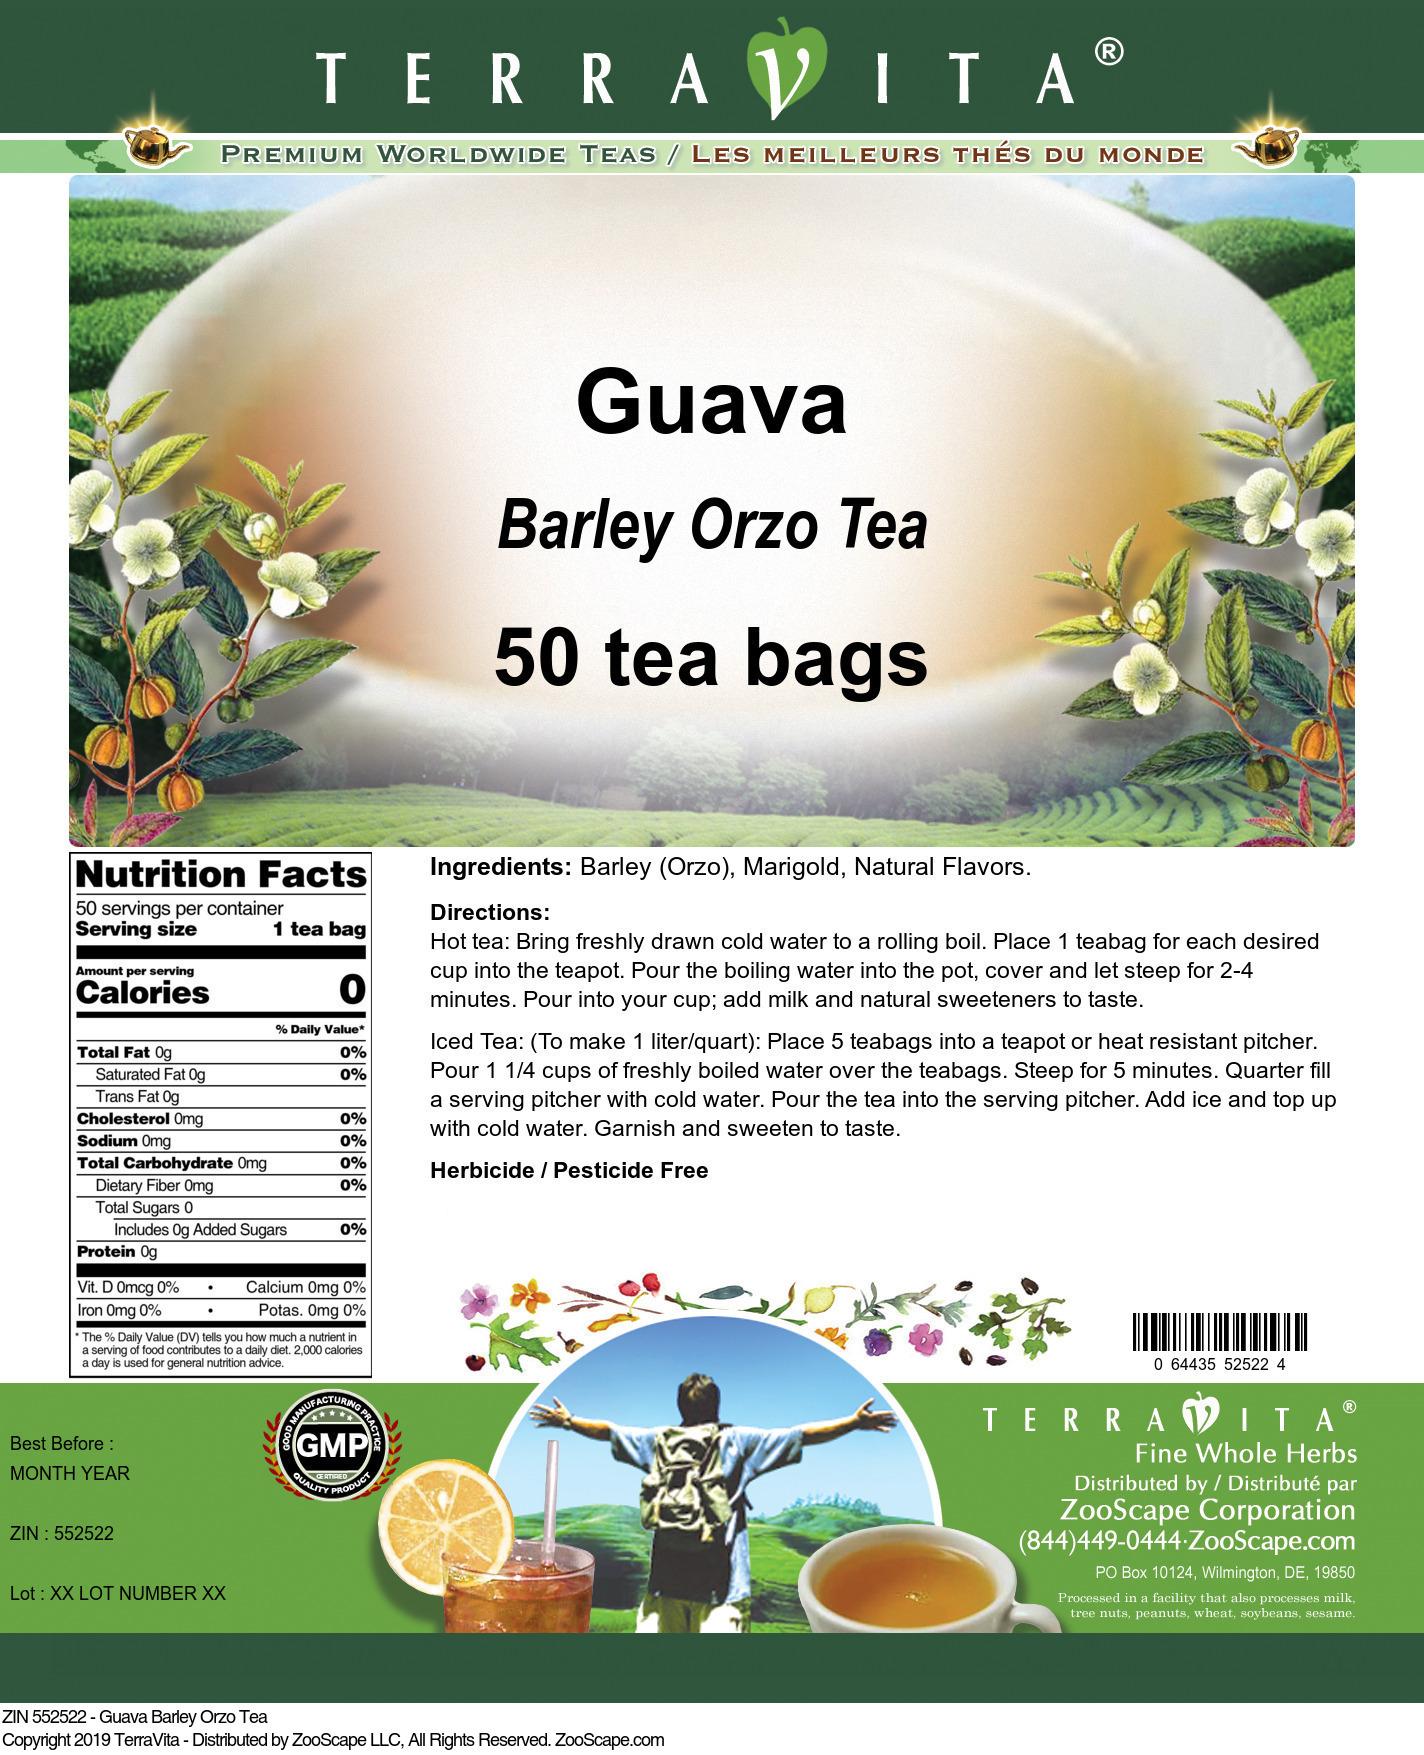 Guava Barley Orzo Tea